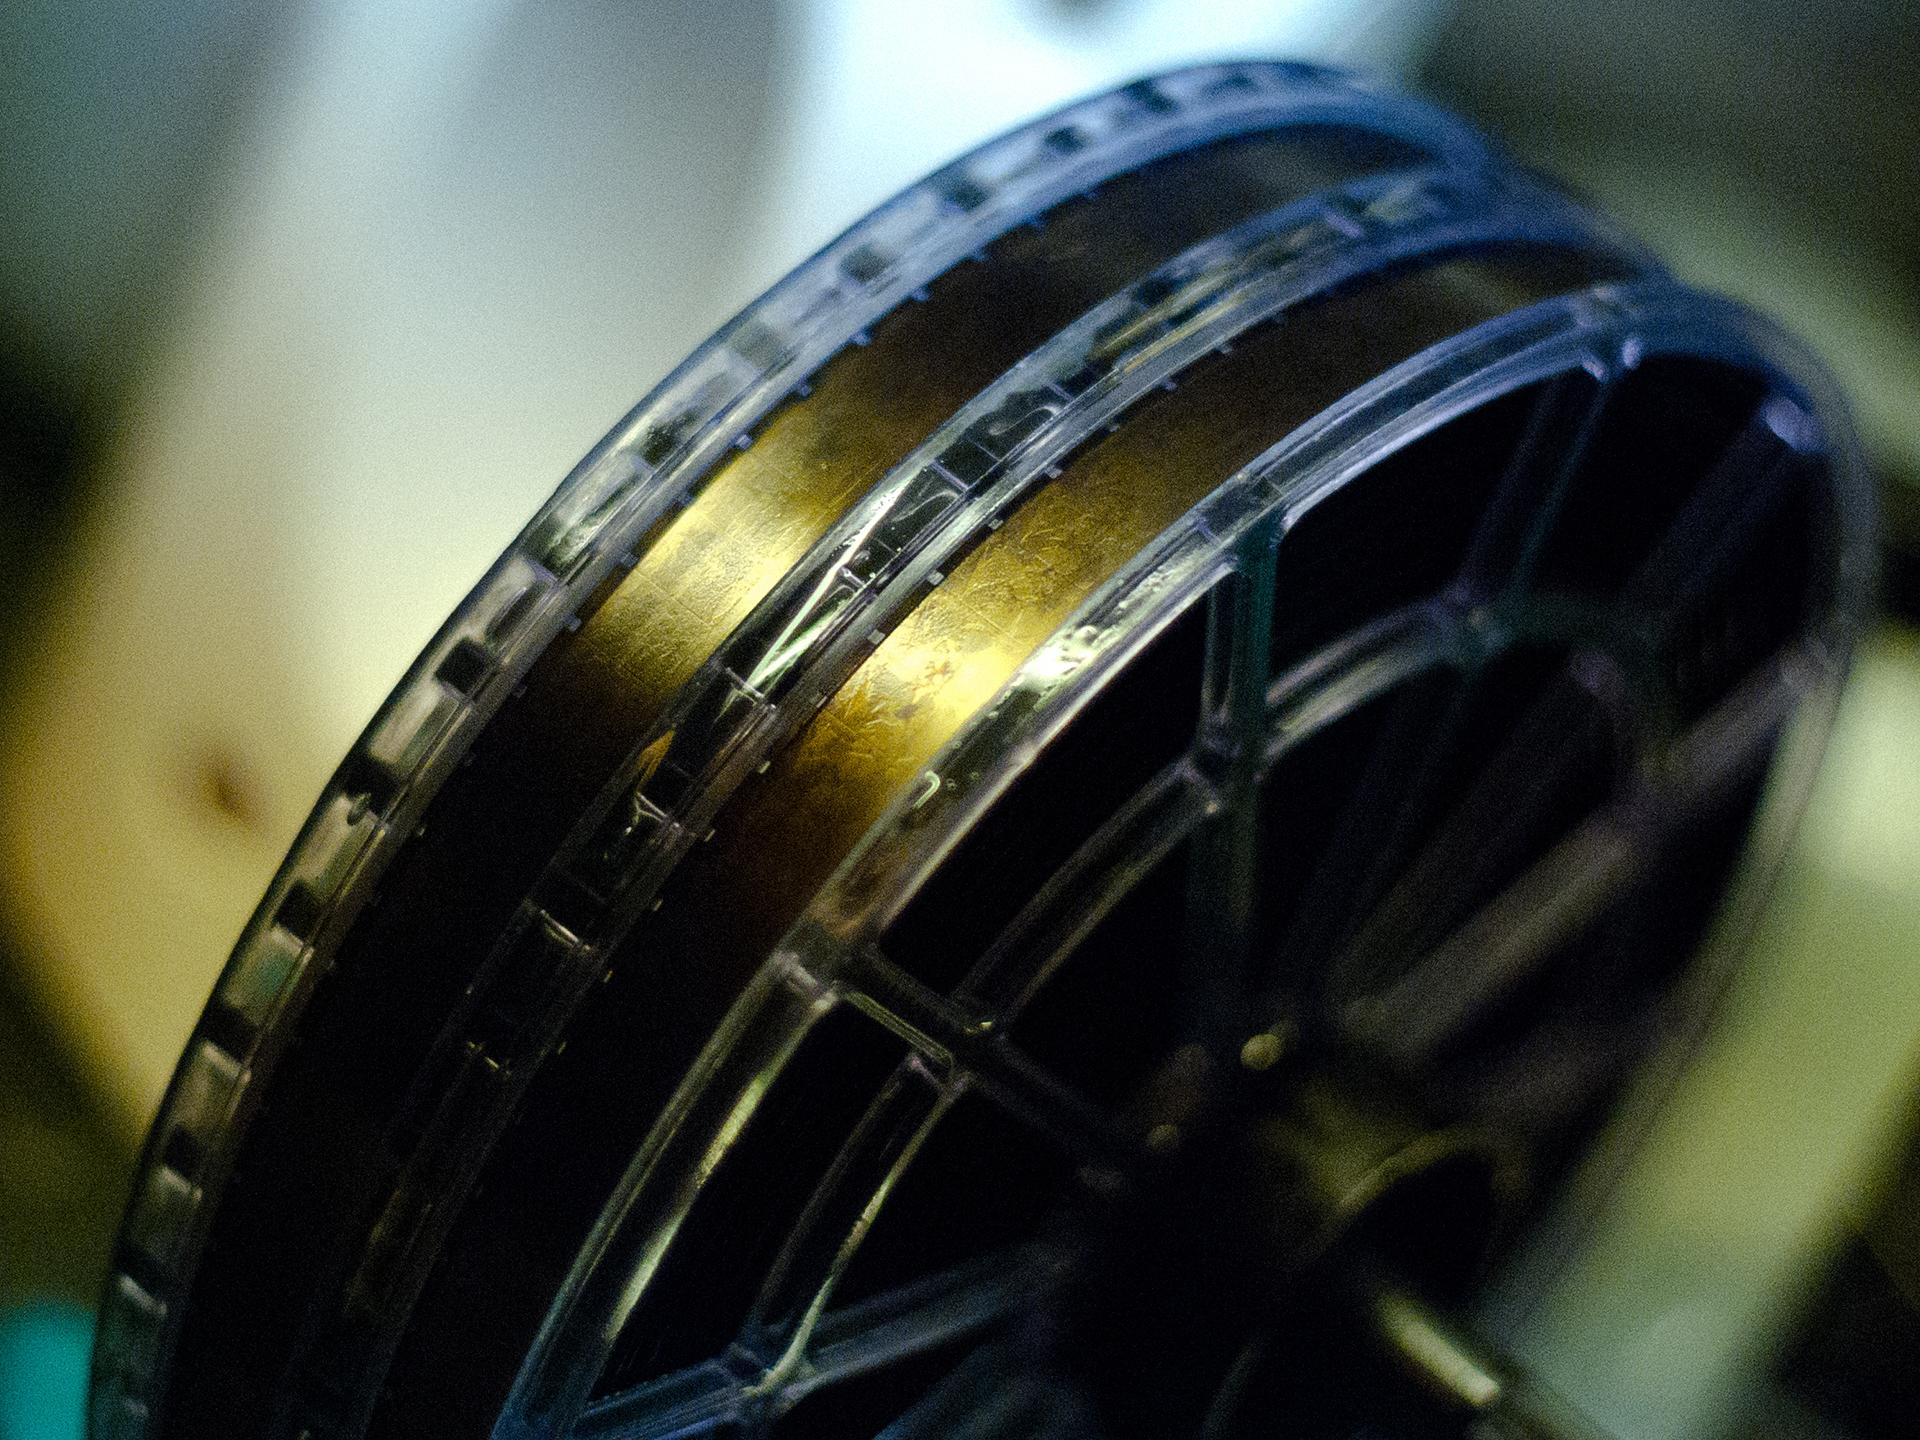 Film Emulsion